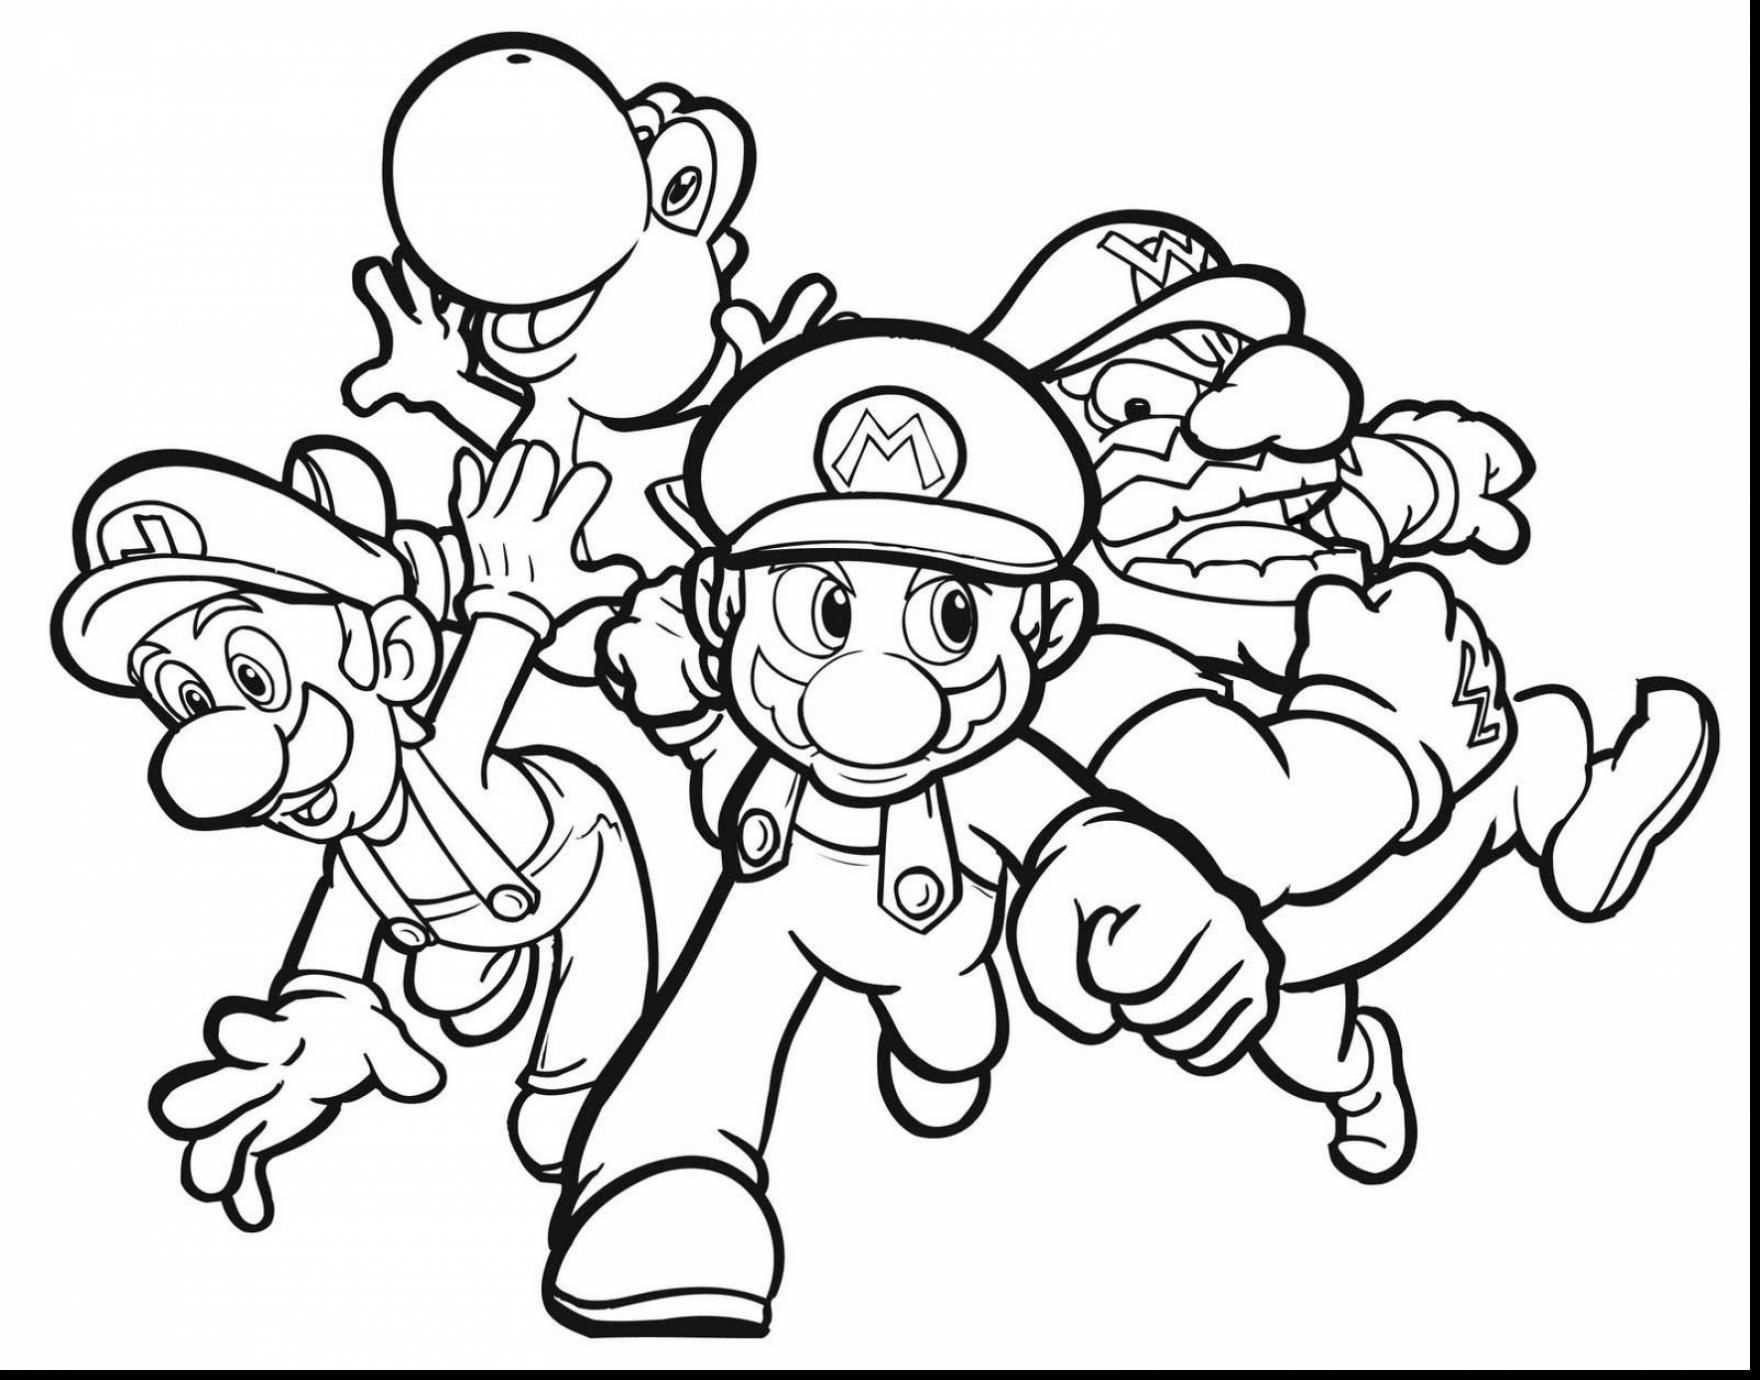 Kleurplaat Mario Odyssey / Free Printable Mario Coloring ...